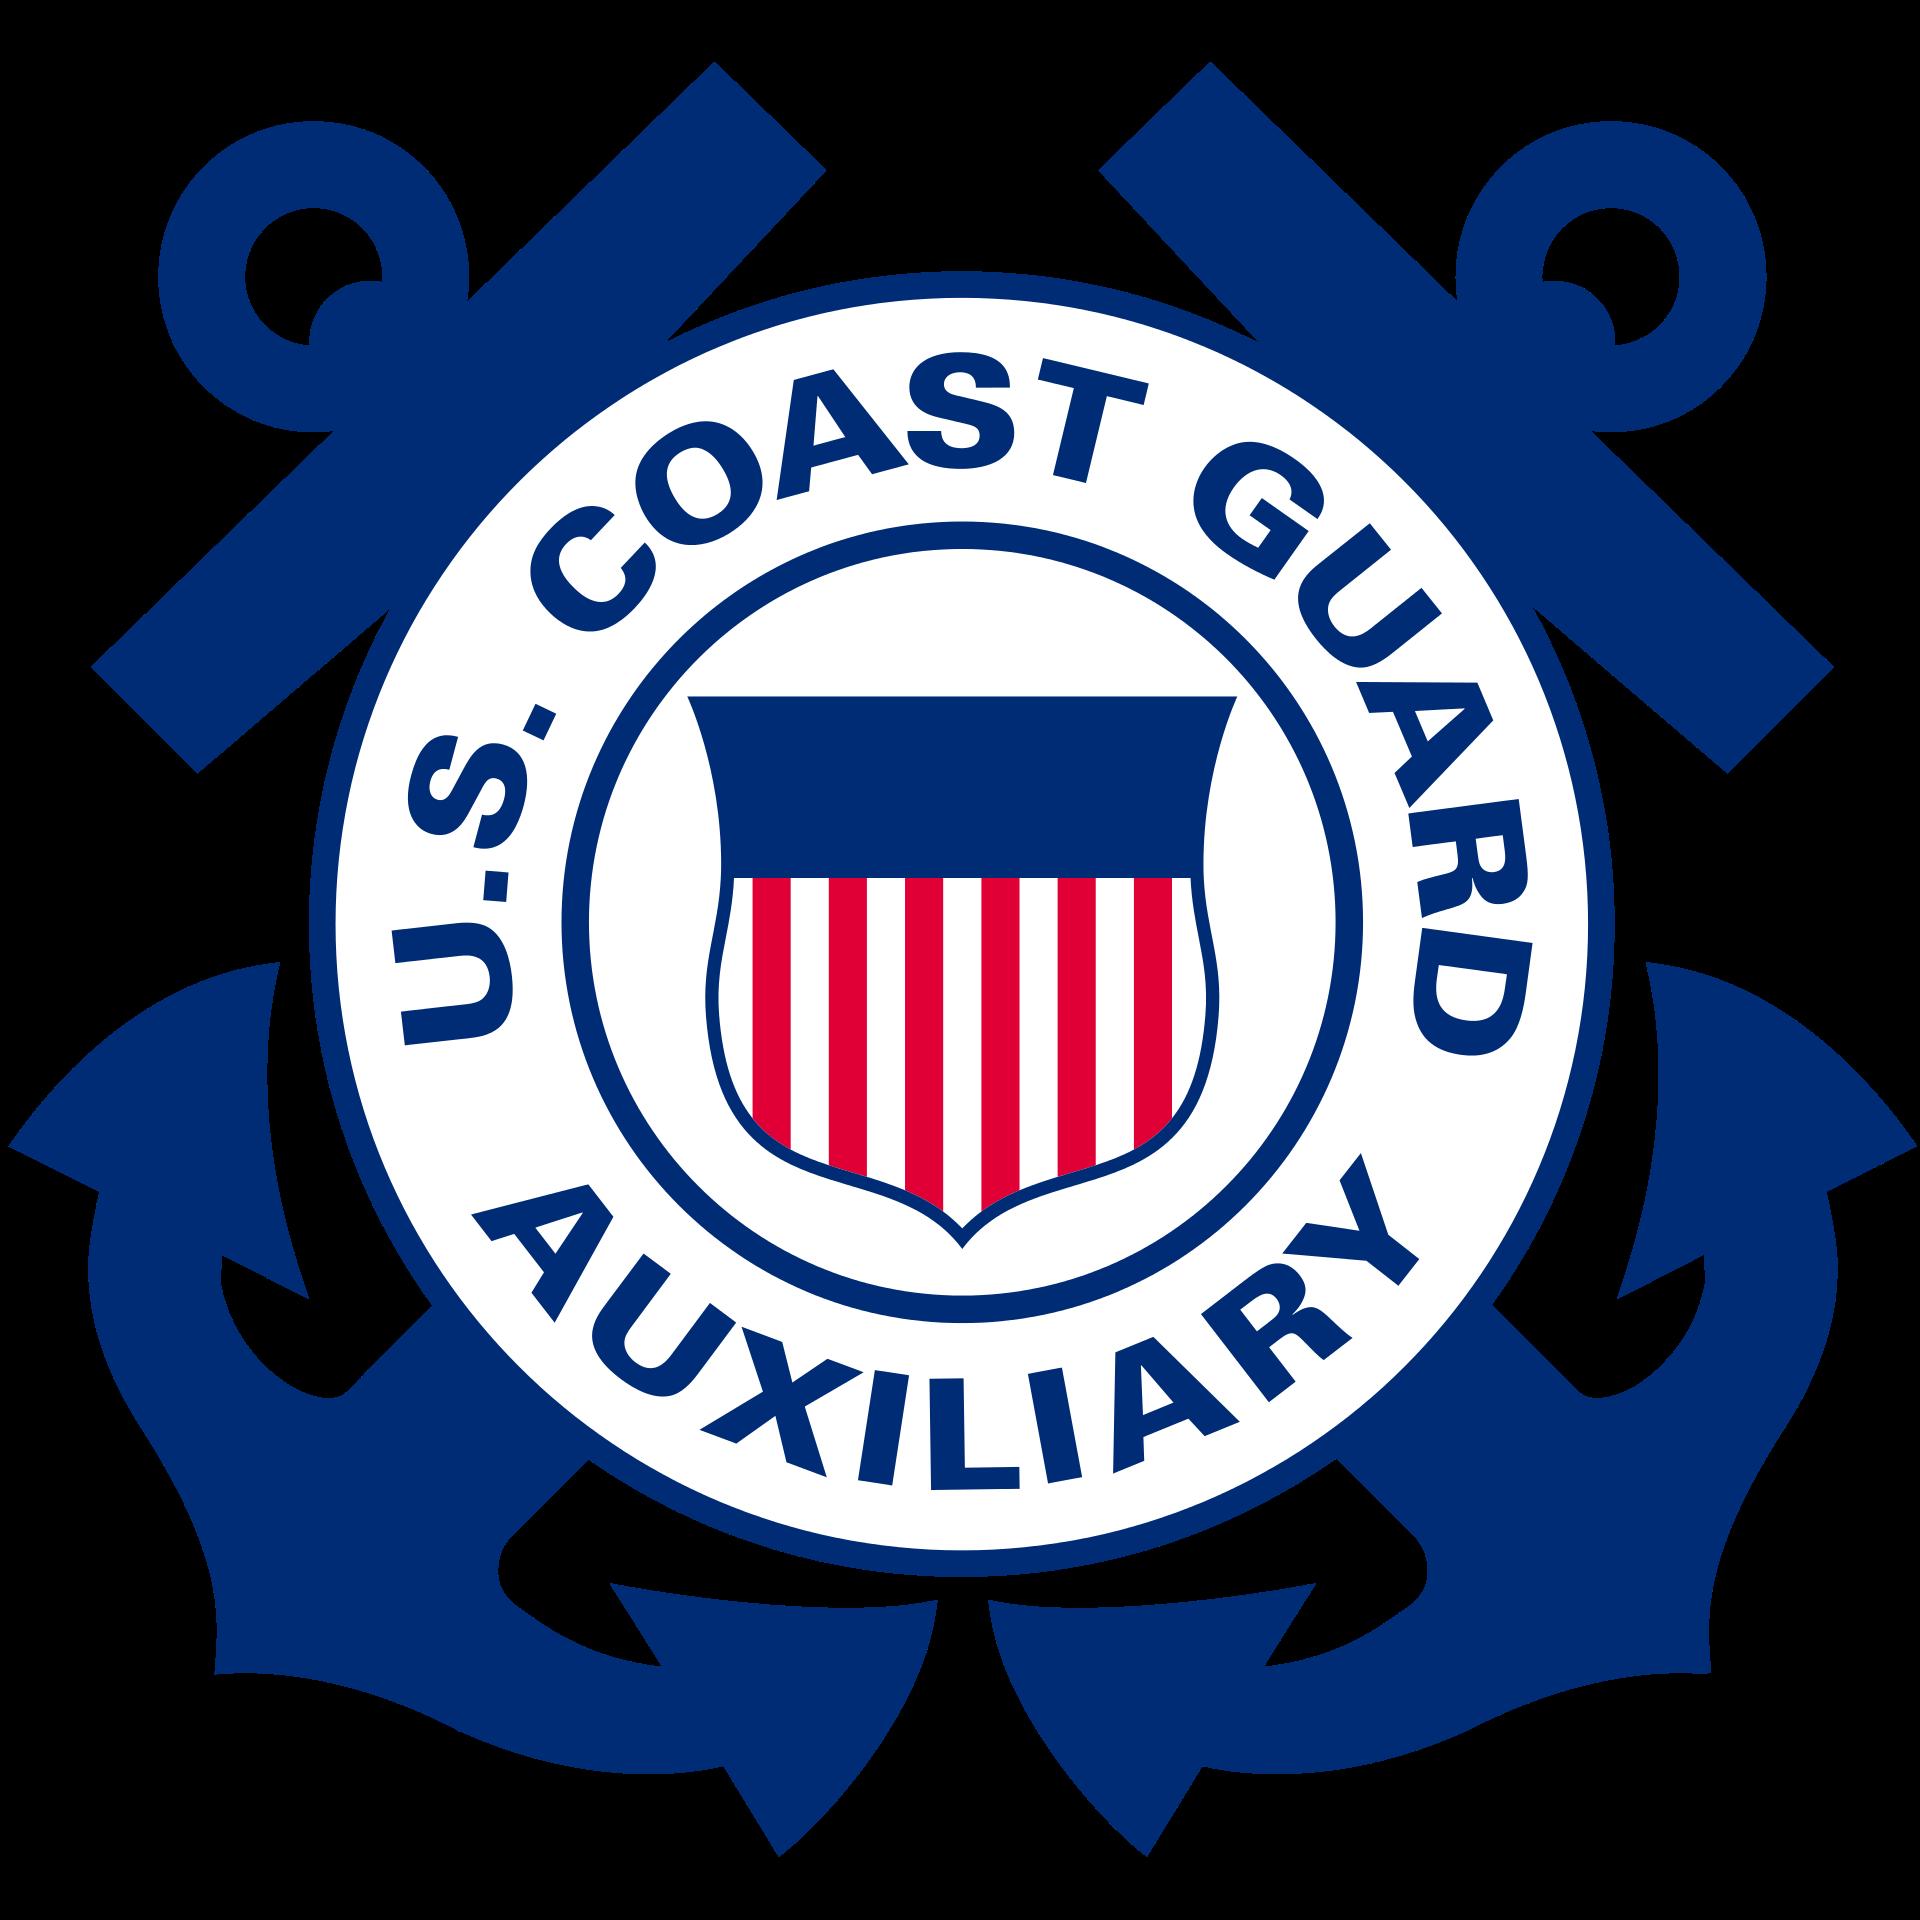 Sailor clipart uniform coast guard. Badge of the united